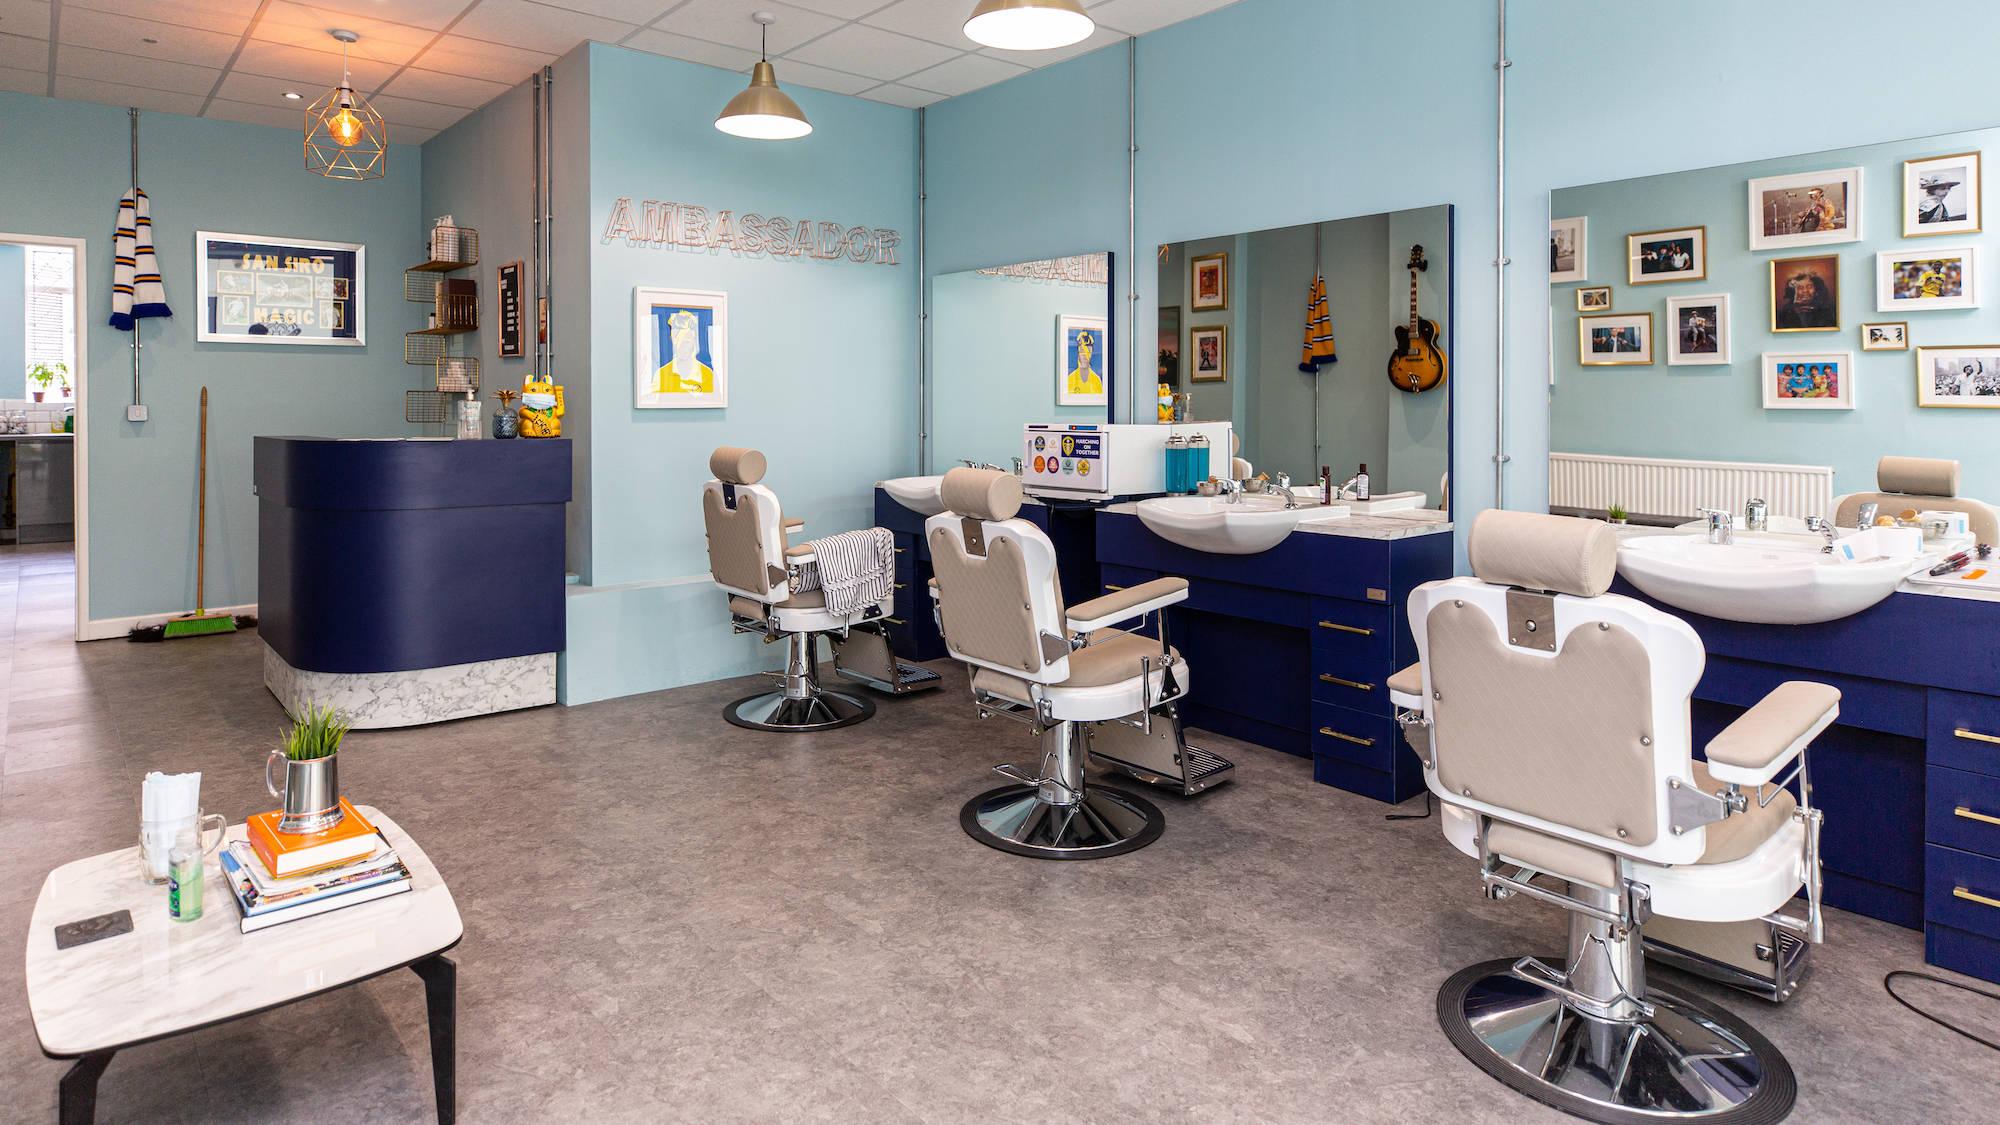 Ambassador Barbering